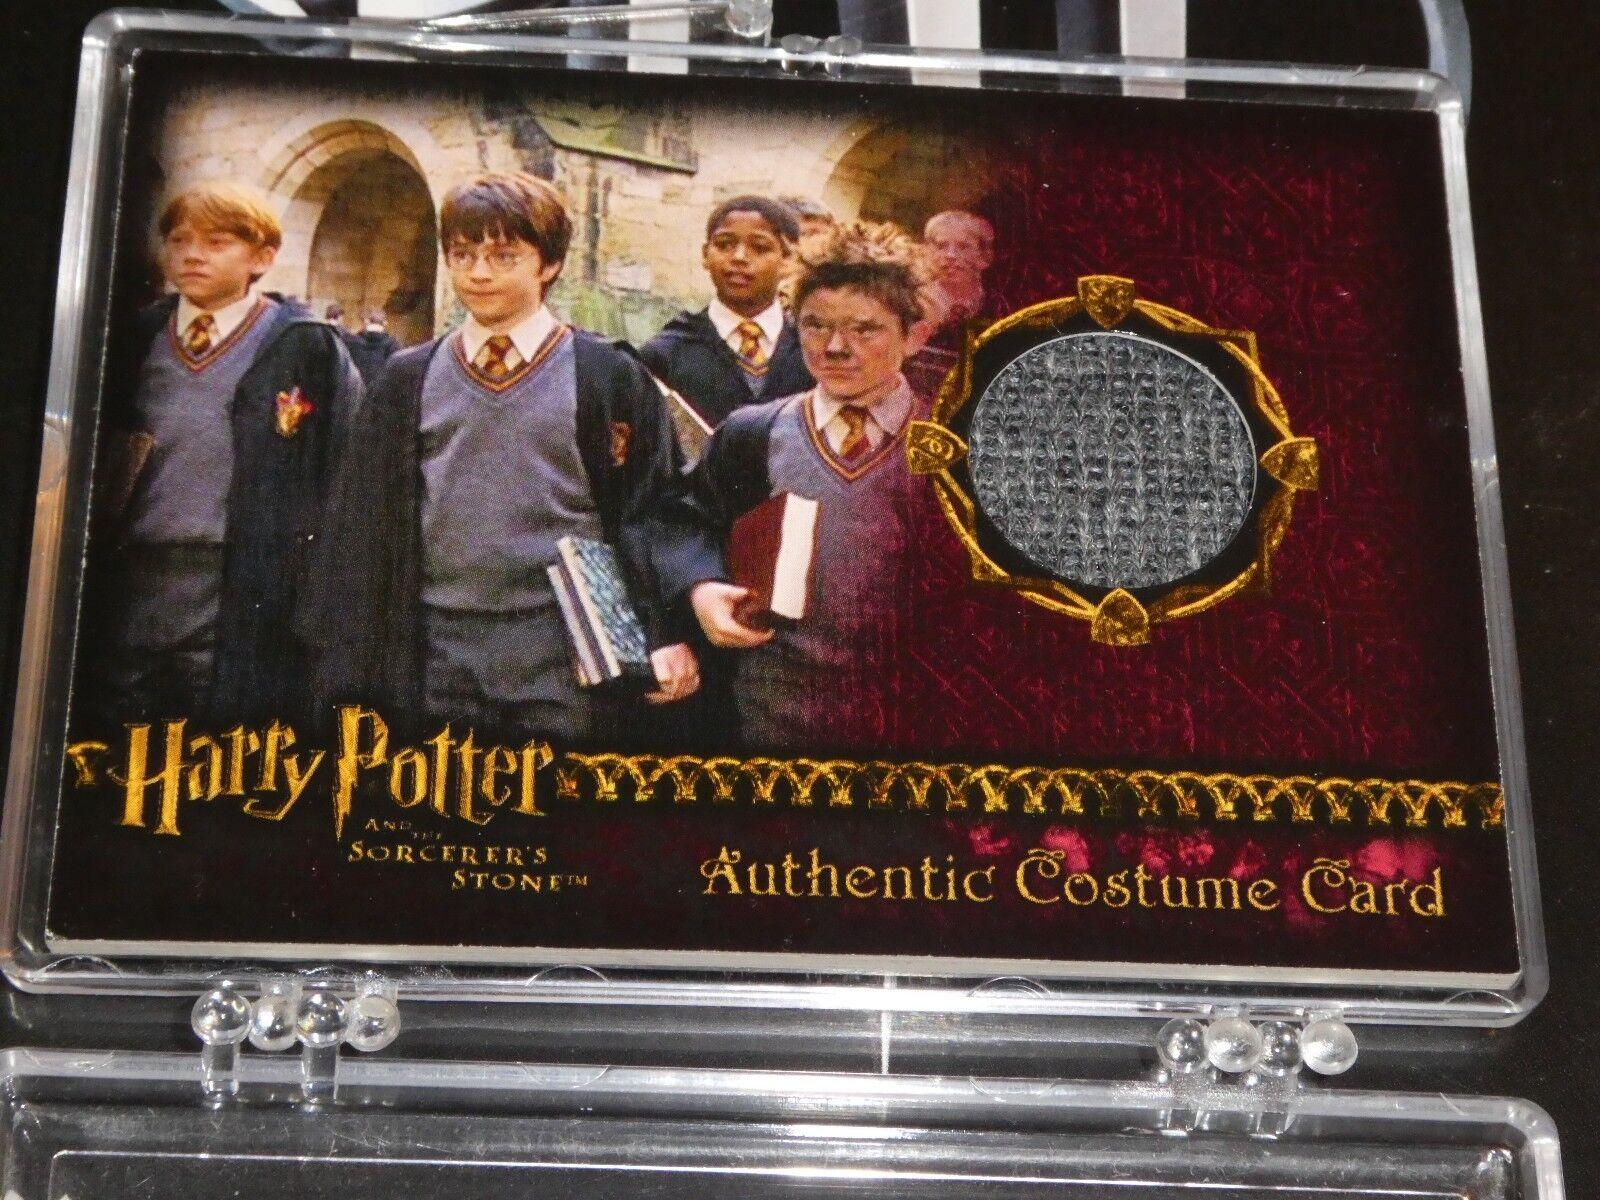 Harry potter élégant's stone gryffindor students authentic costume card 329 460